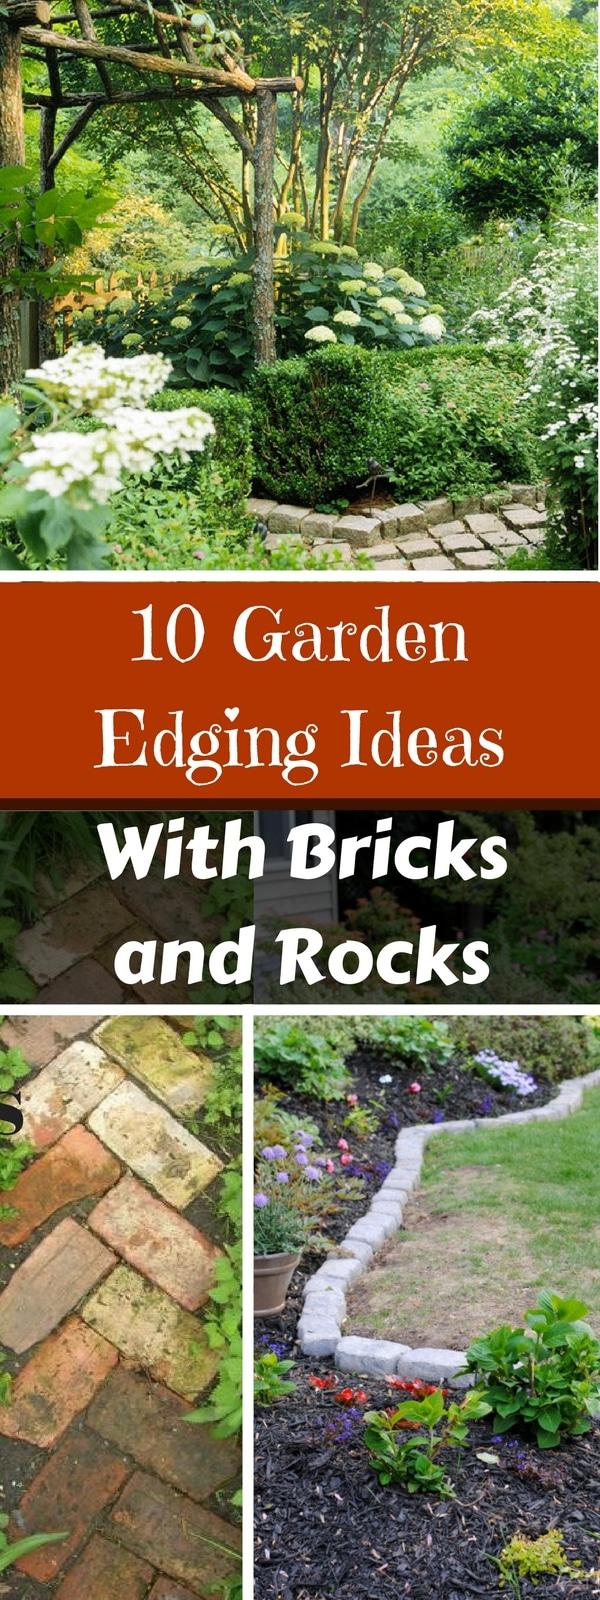 10 Garden Edging Ideas